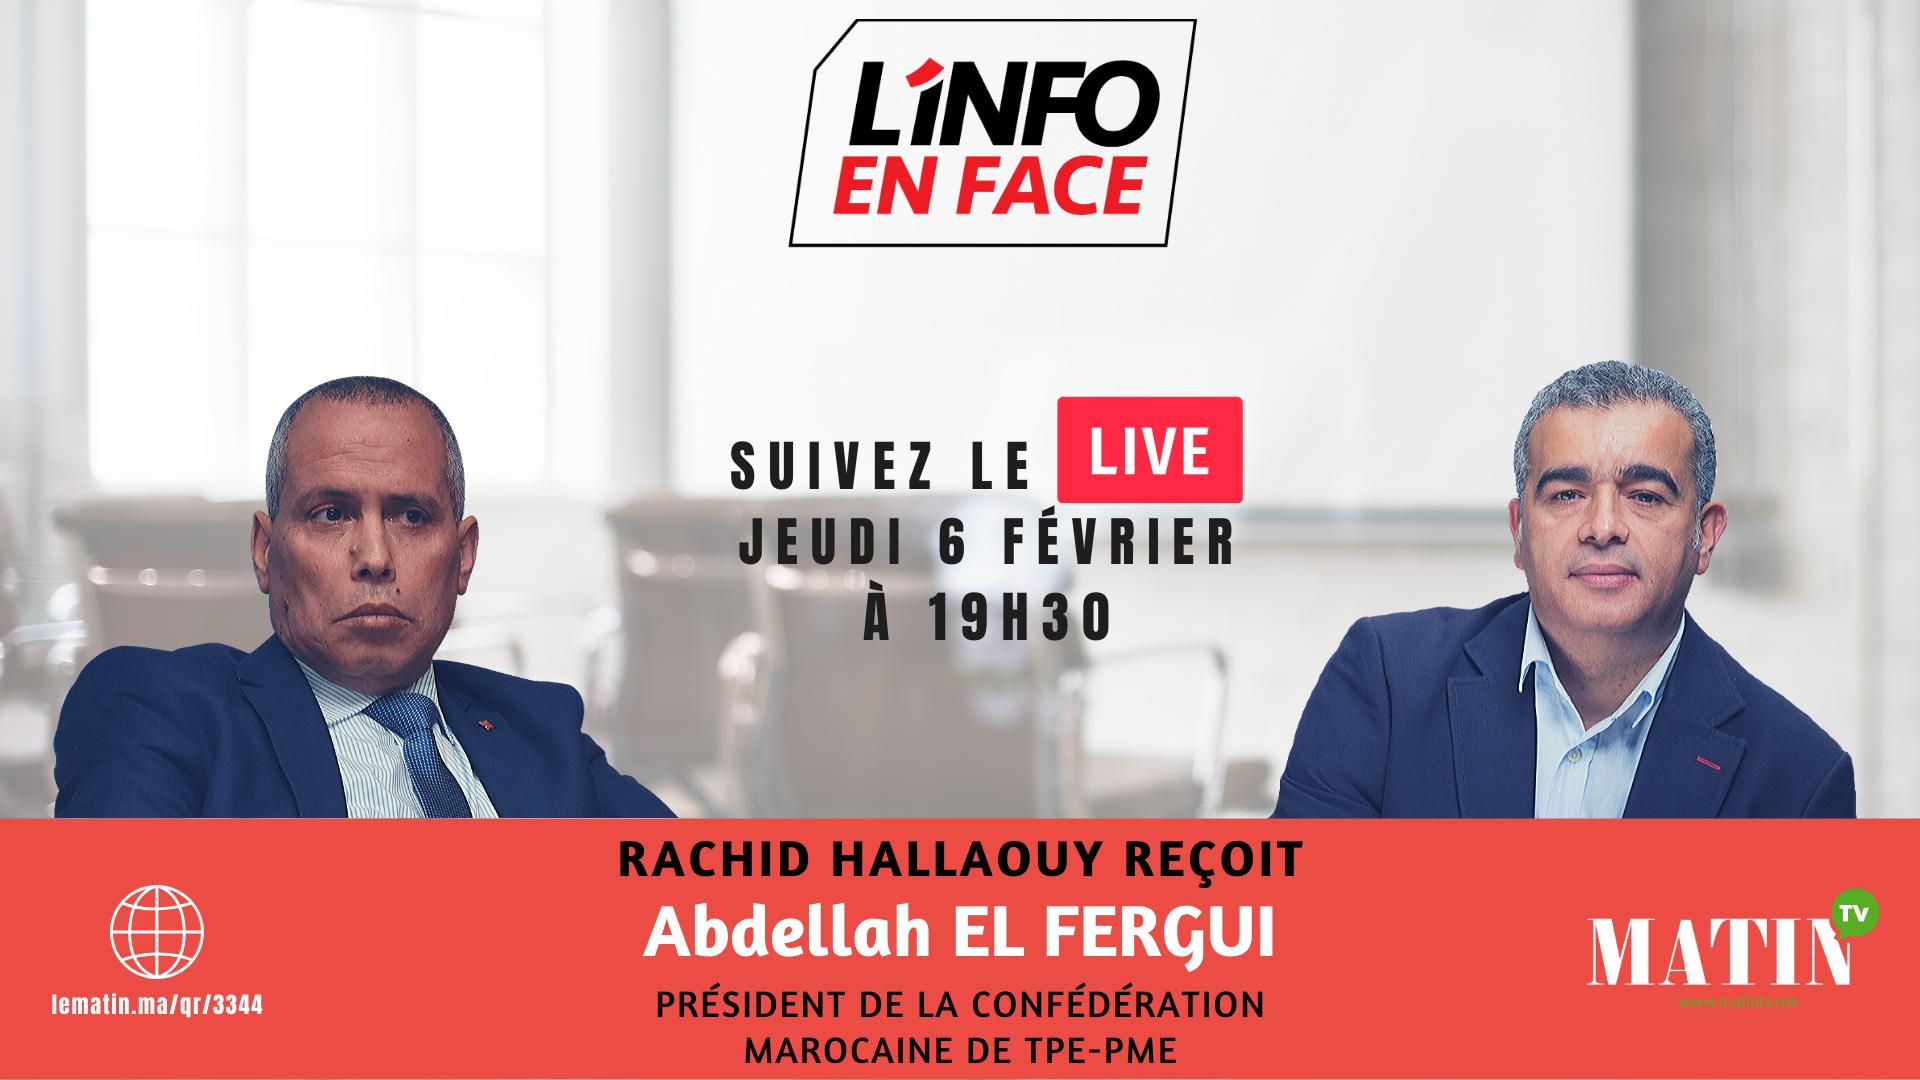 Live : L'Info en Face avec Abdellah El Fergui